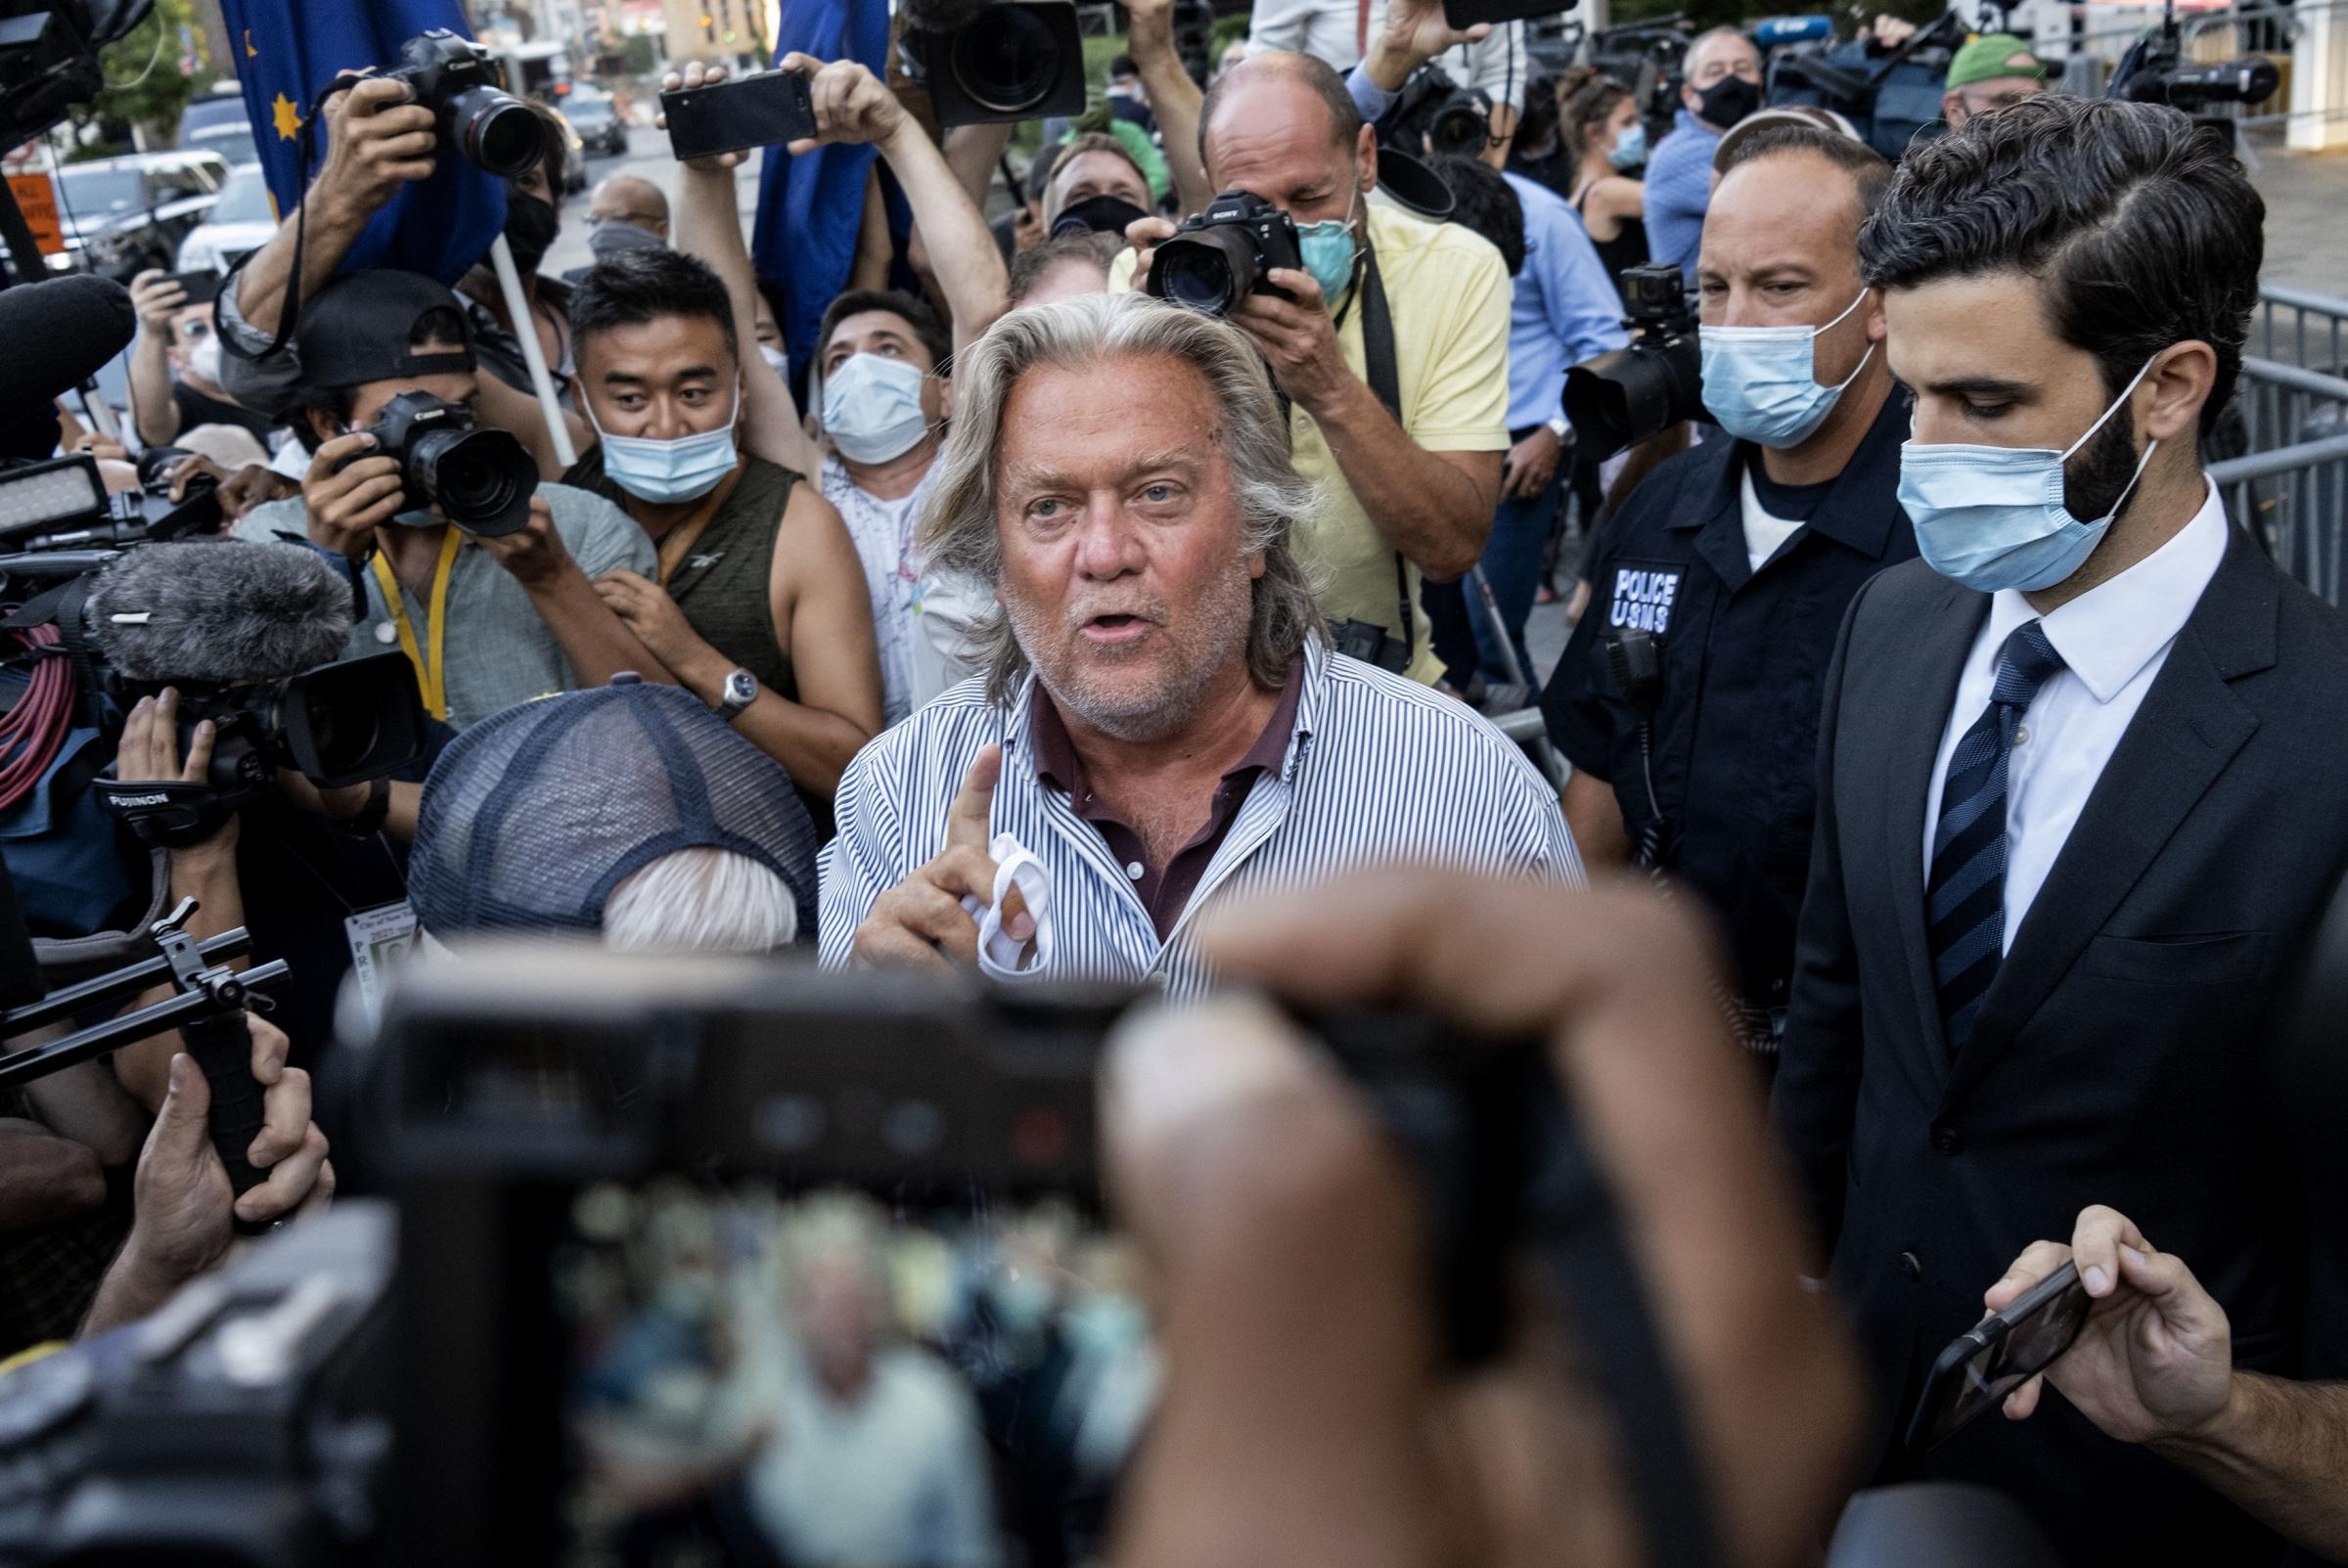 Steve Bannon among Donald Trump associates subpoenaed in Capitol riot inquiry